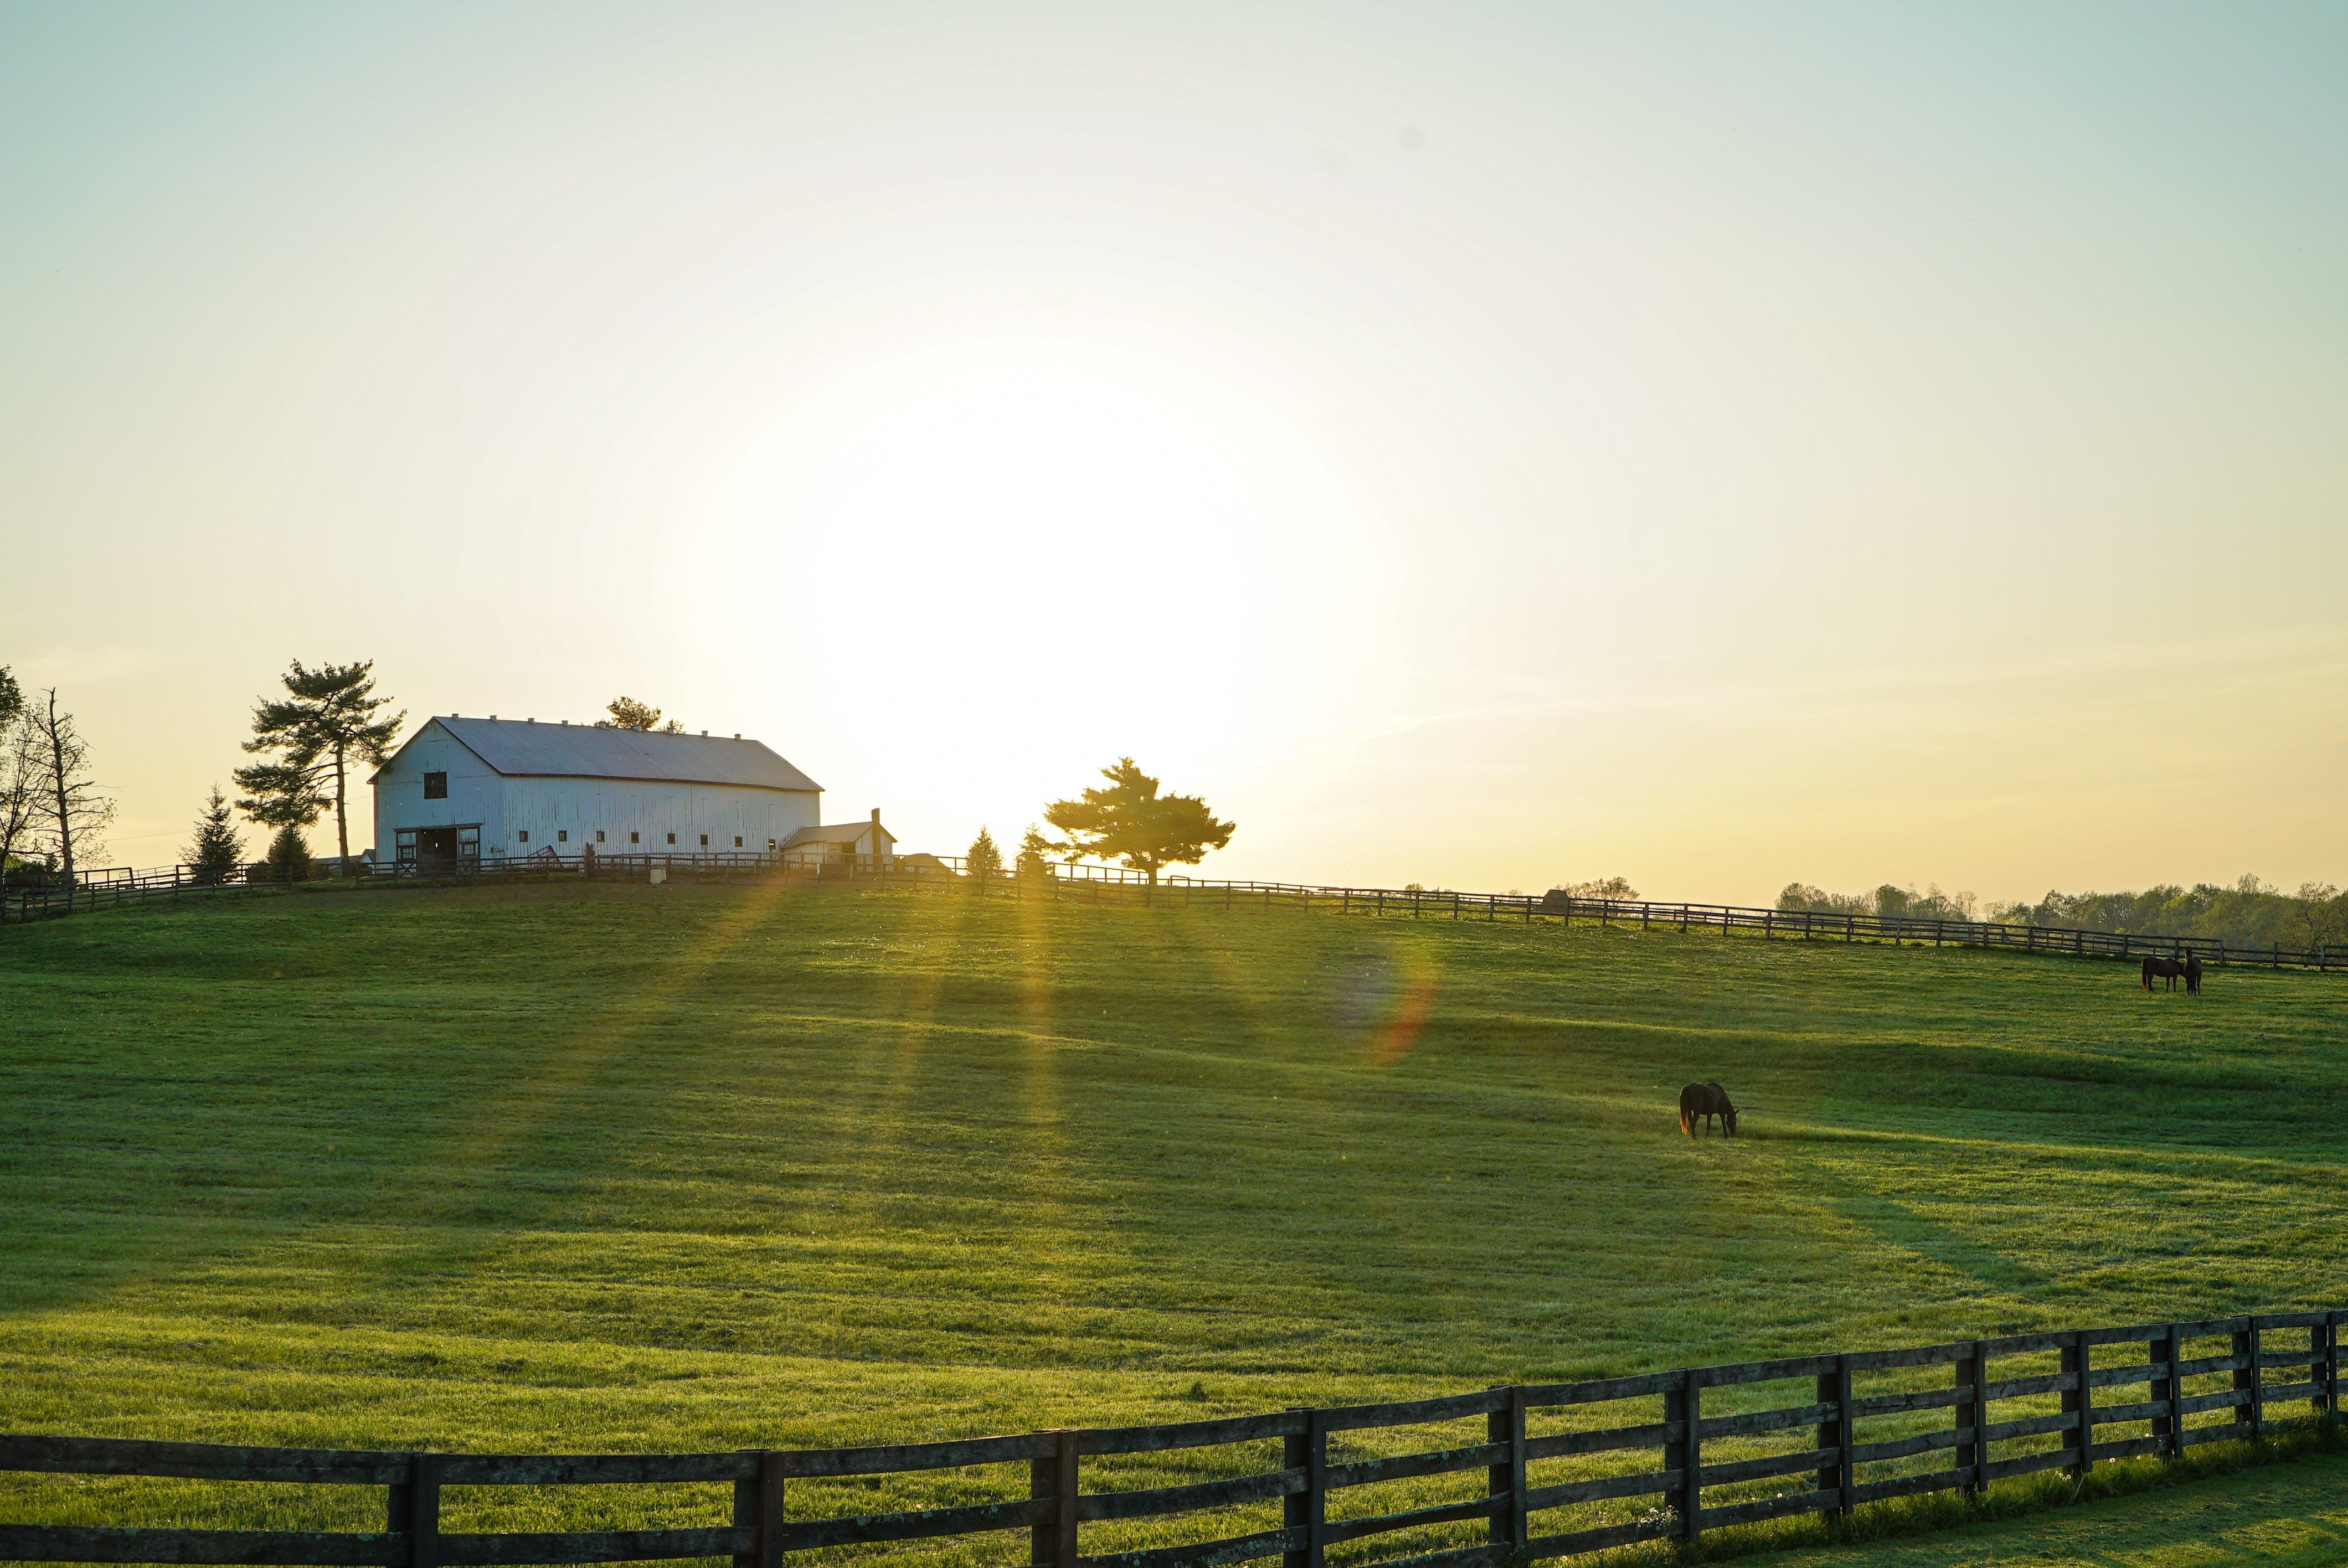 Fotos de stock gratuitas de arboles, caballo, campo, campos de cultivo